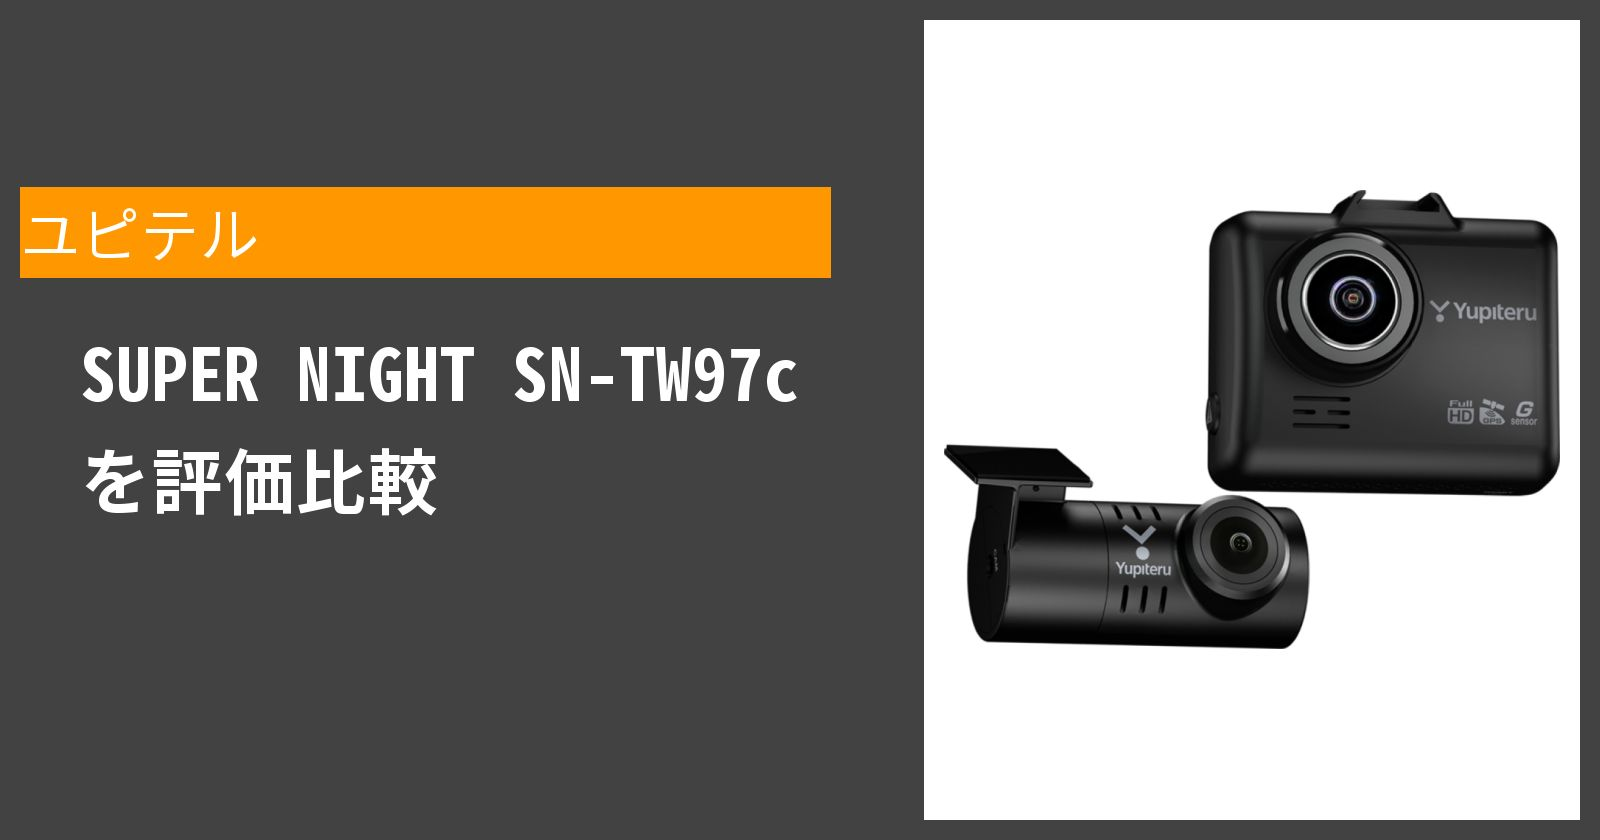 SUPER NIGHT SN-TW97cを徹底評価